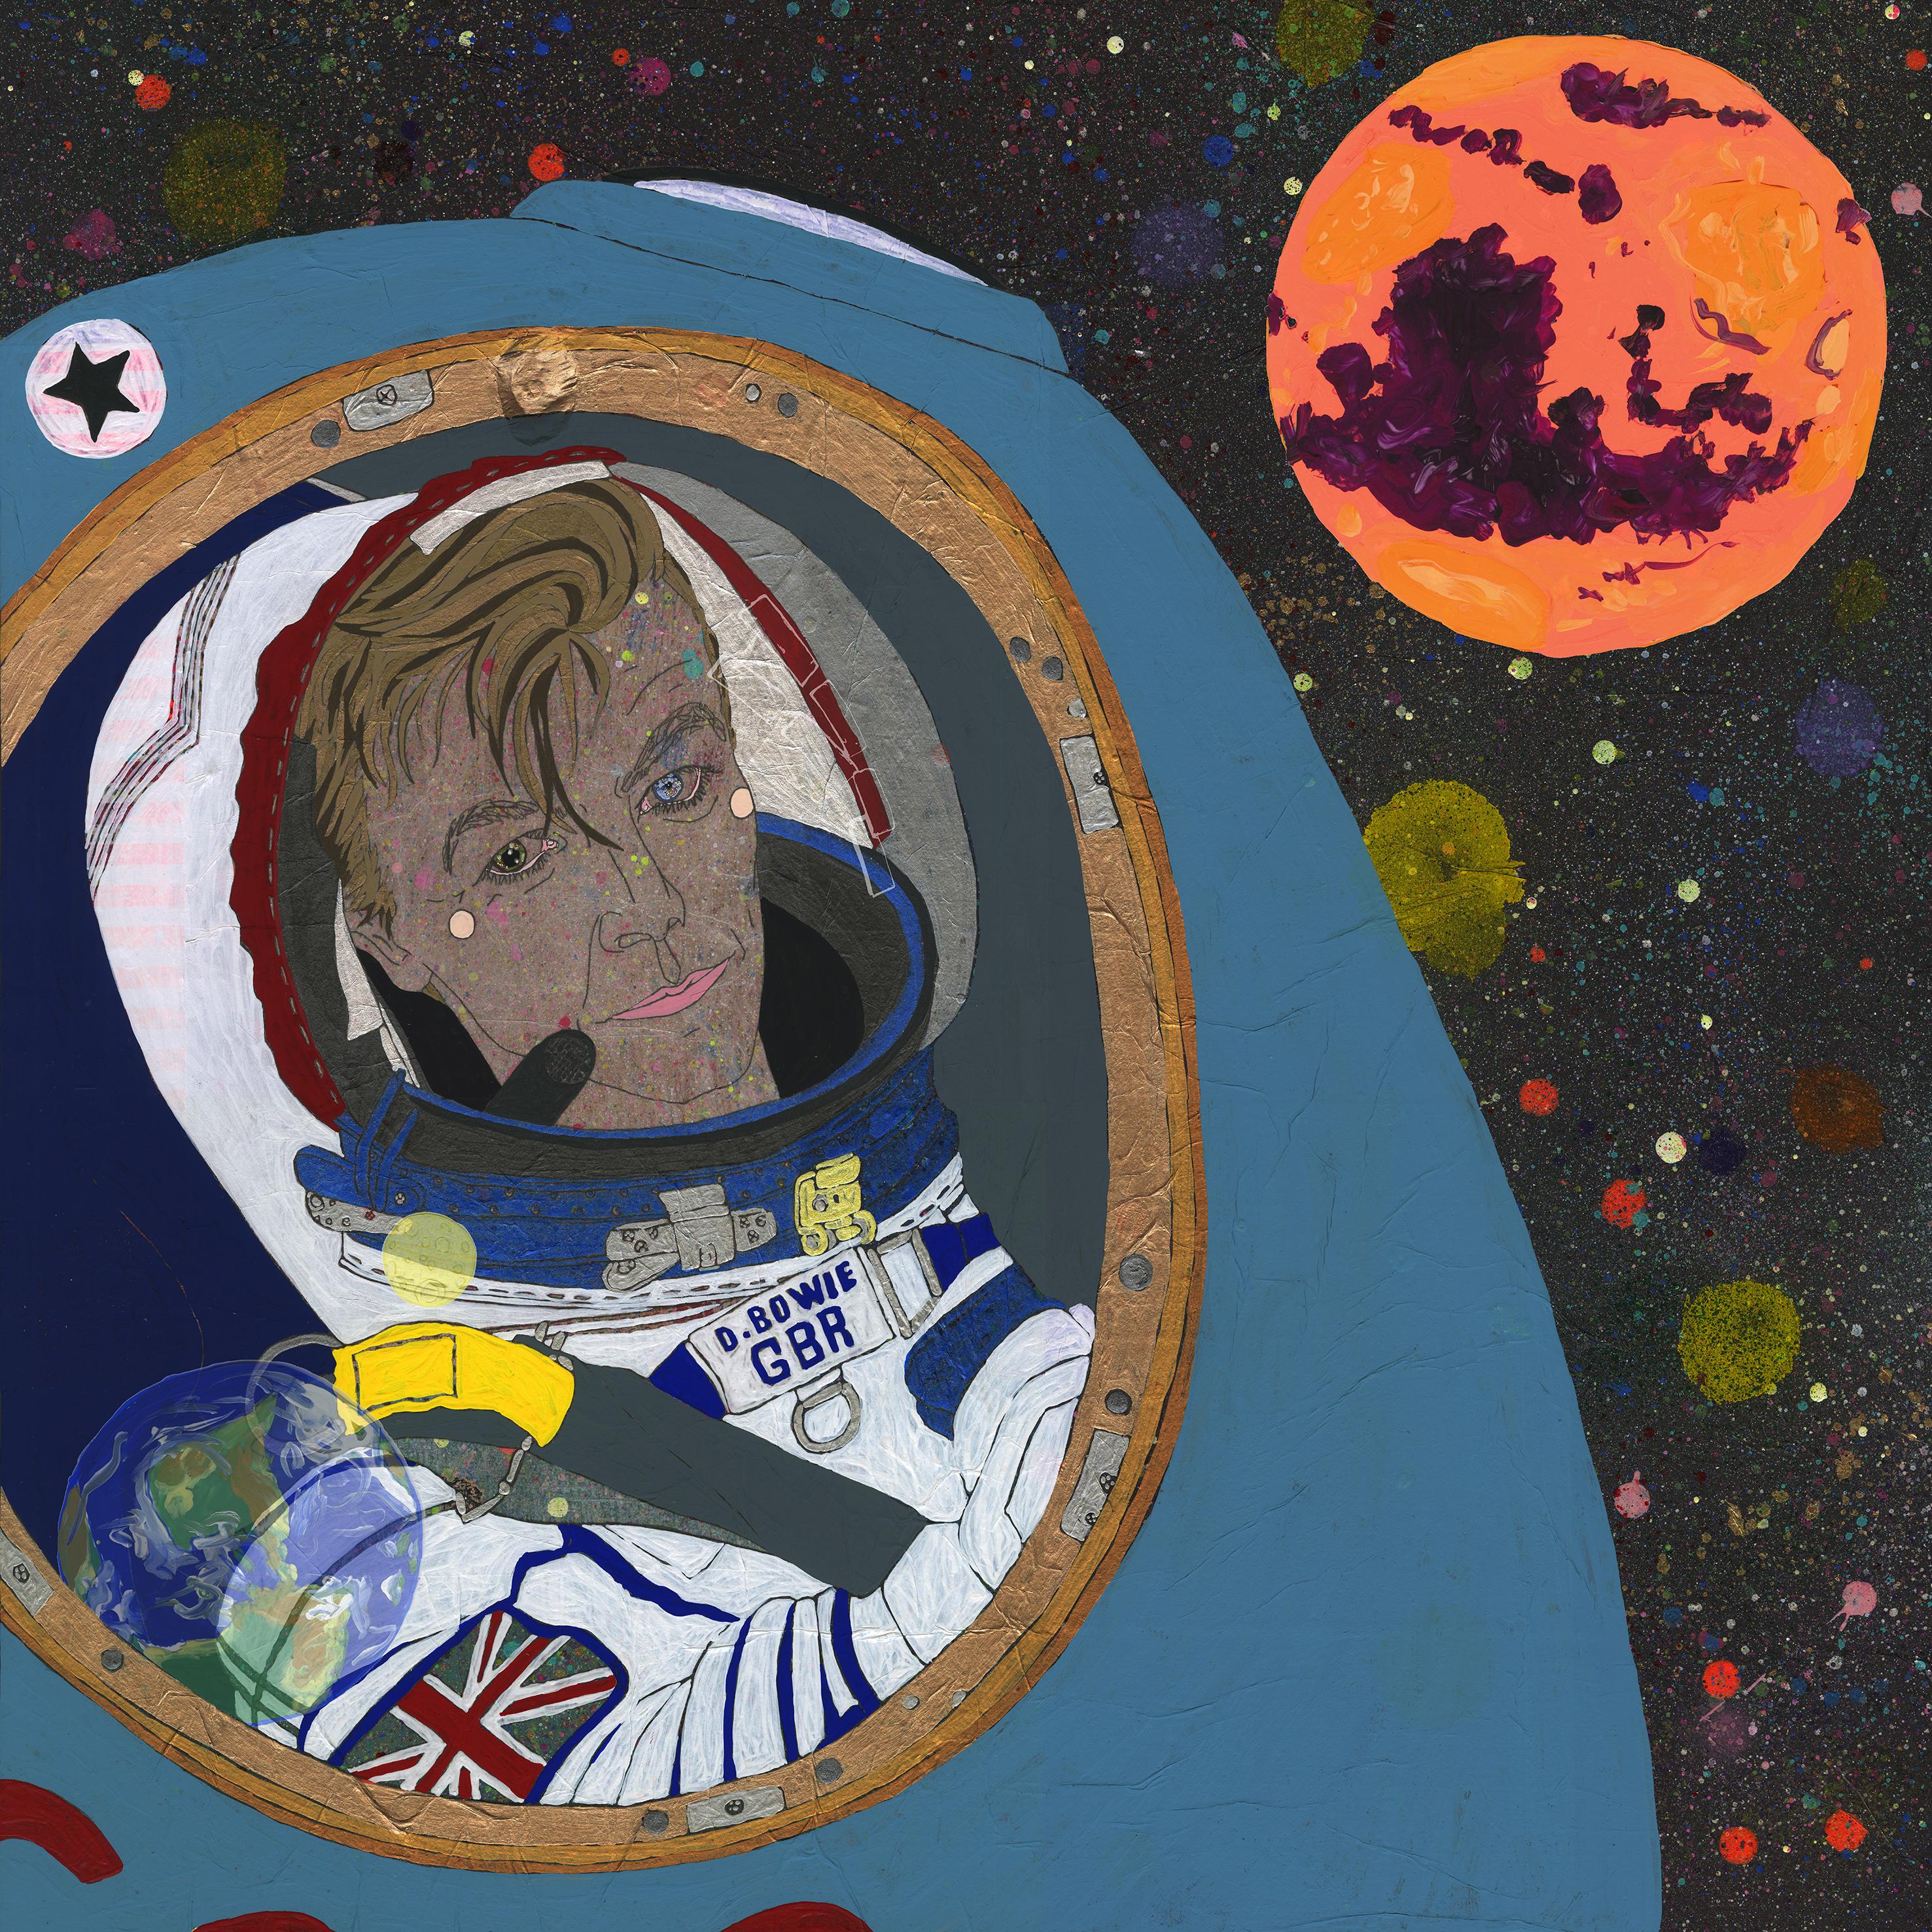 AFP-Jherek_Space Oddity_SarahBeetson